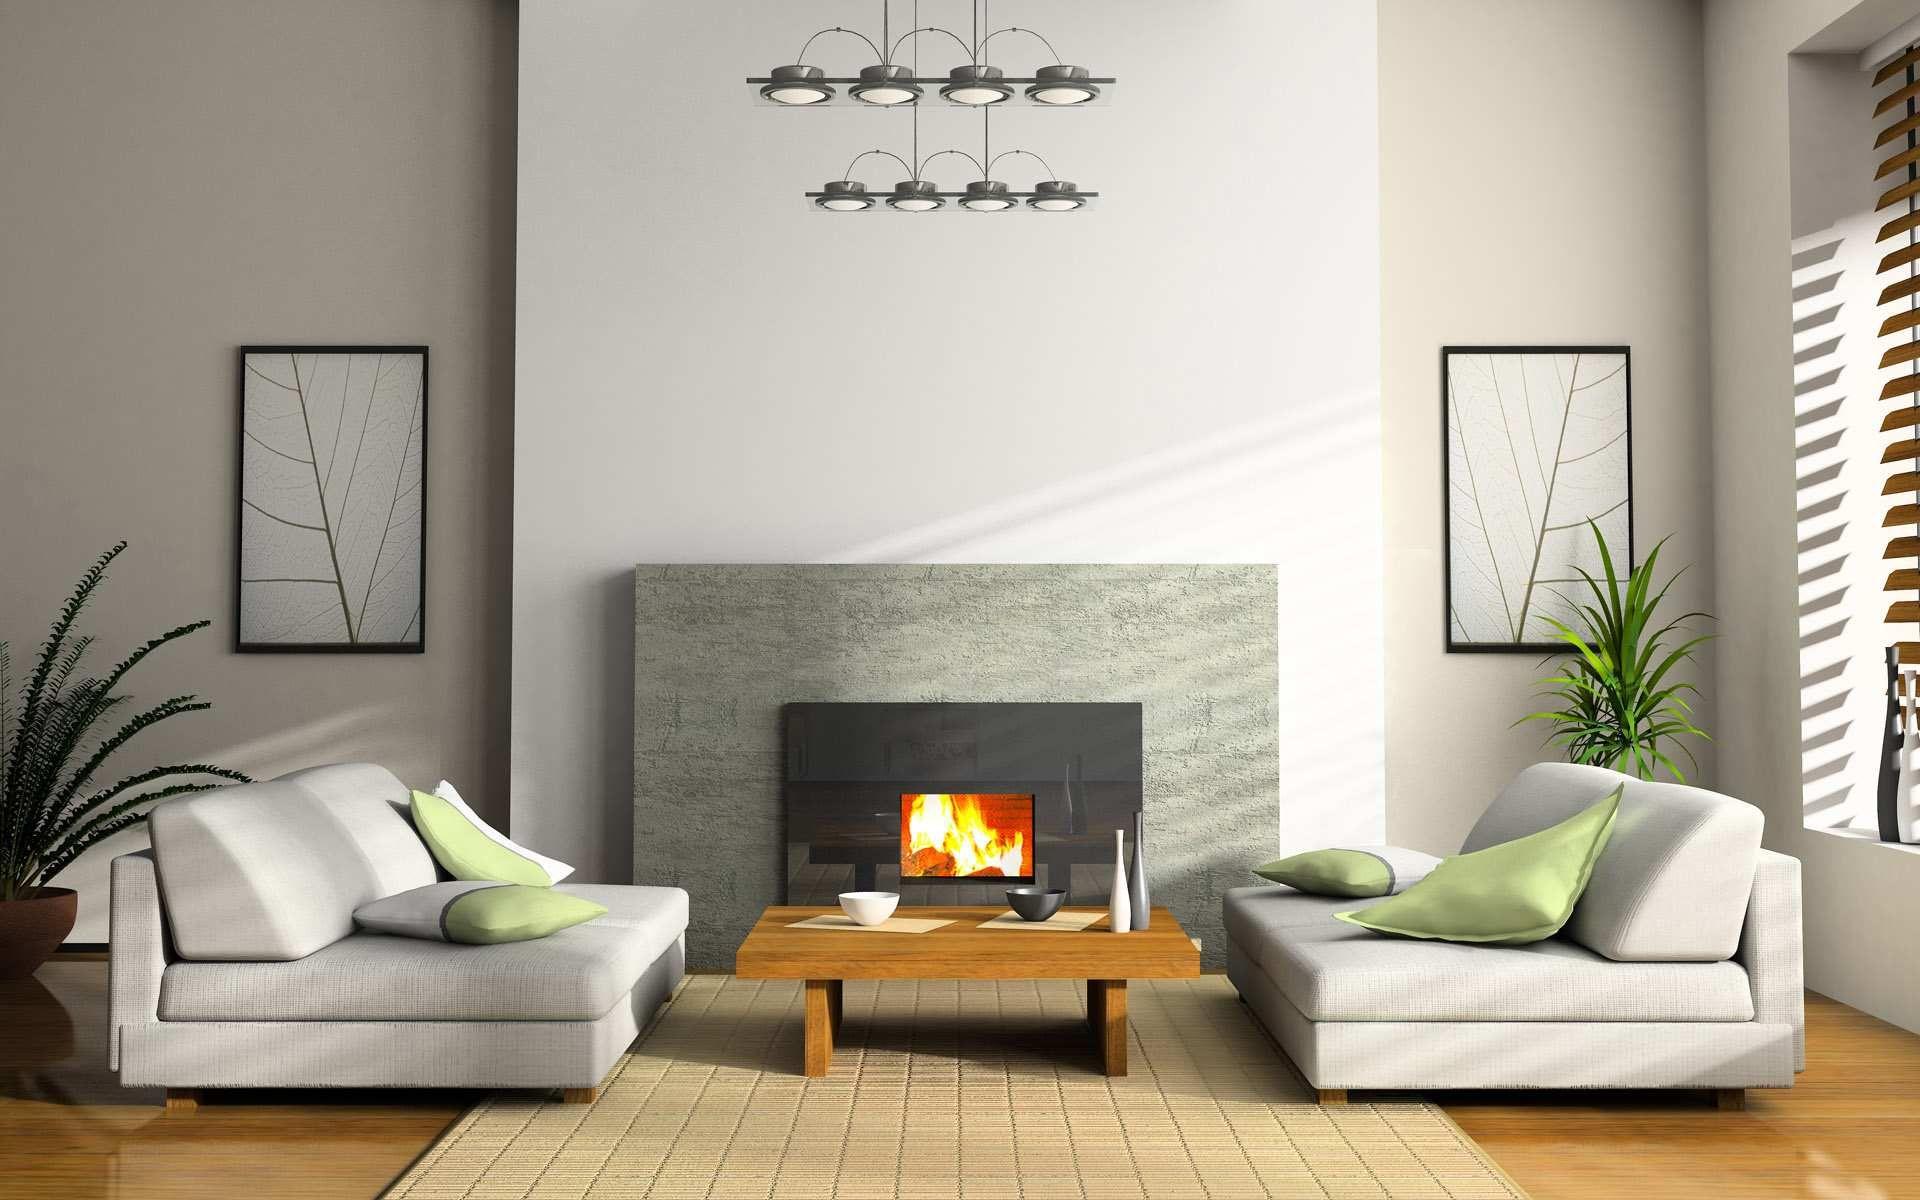 1000+ images about modern living room design on Pinterest - ^